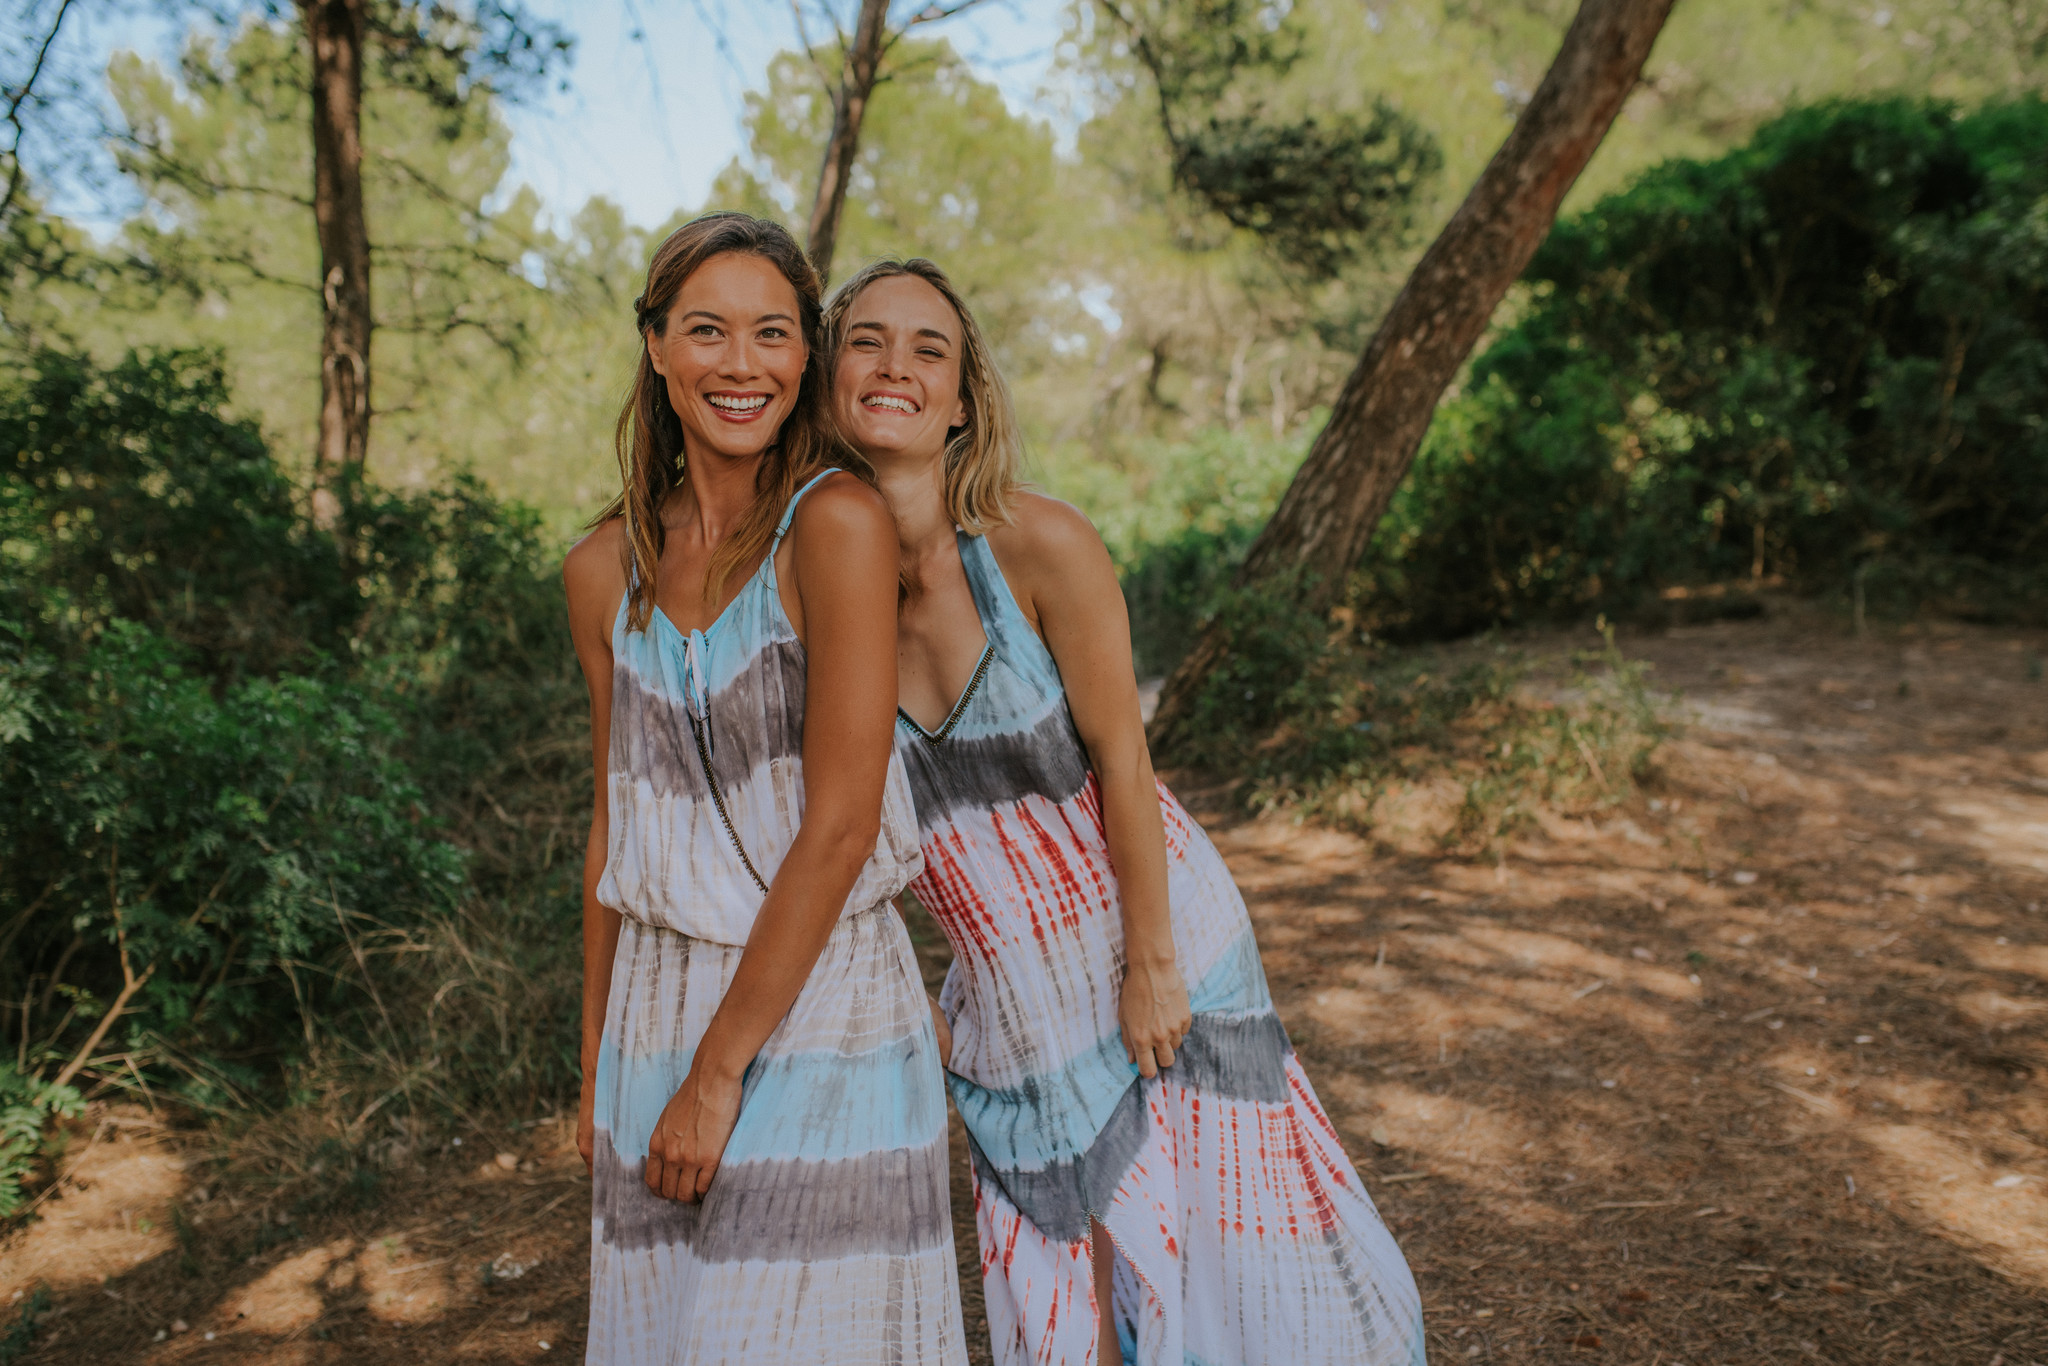 The fashion of Ibiza